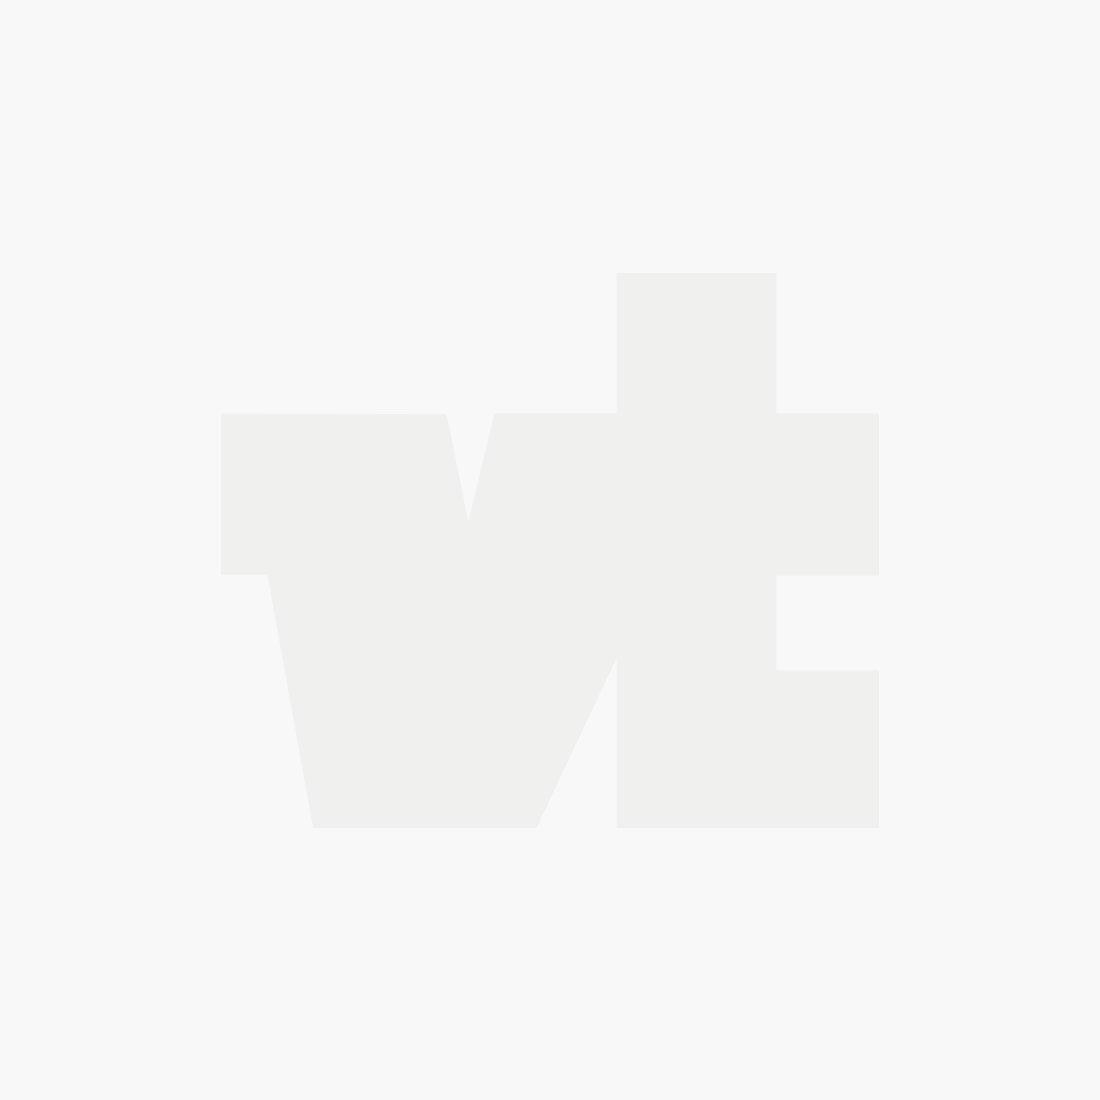 Crewneck cotton 2 tone mouline spicy orange